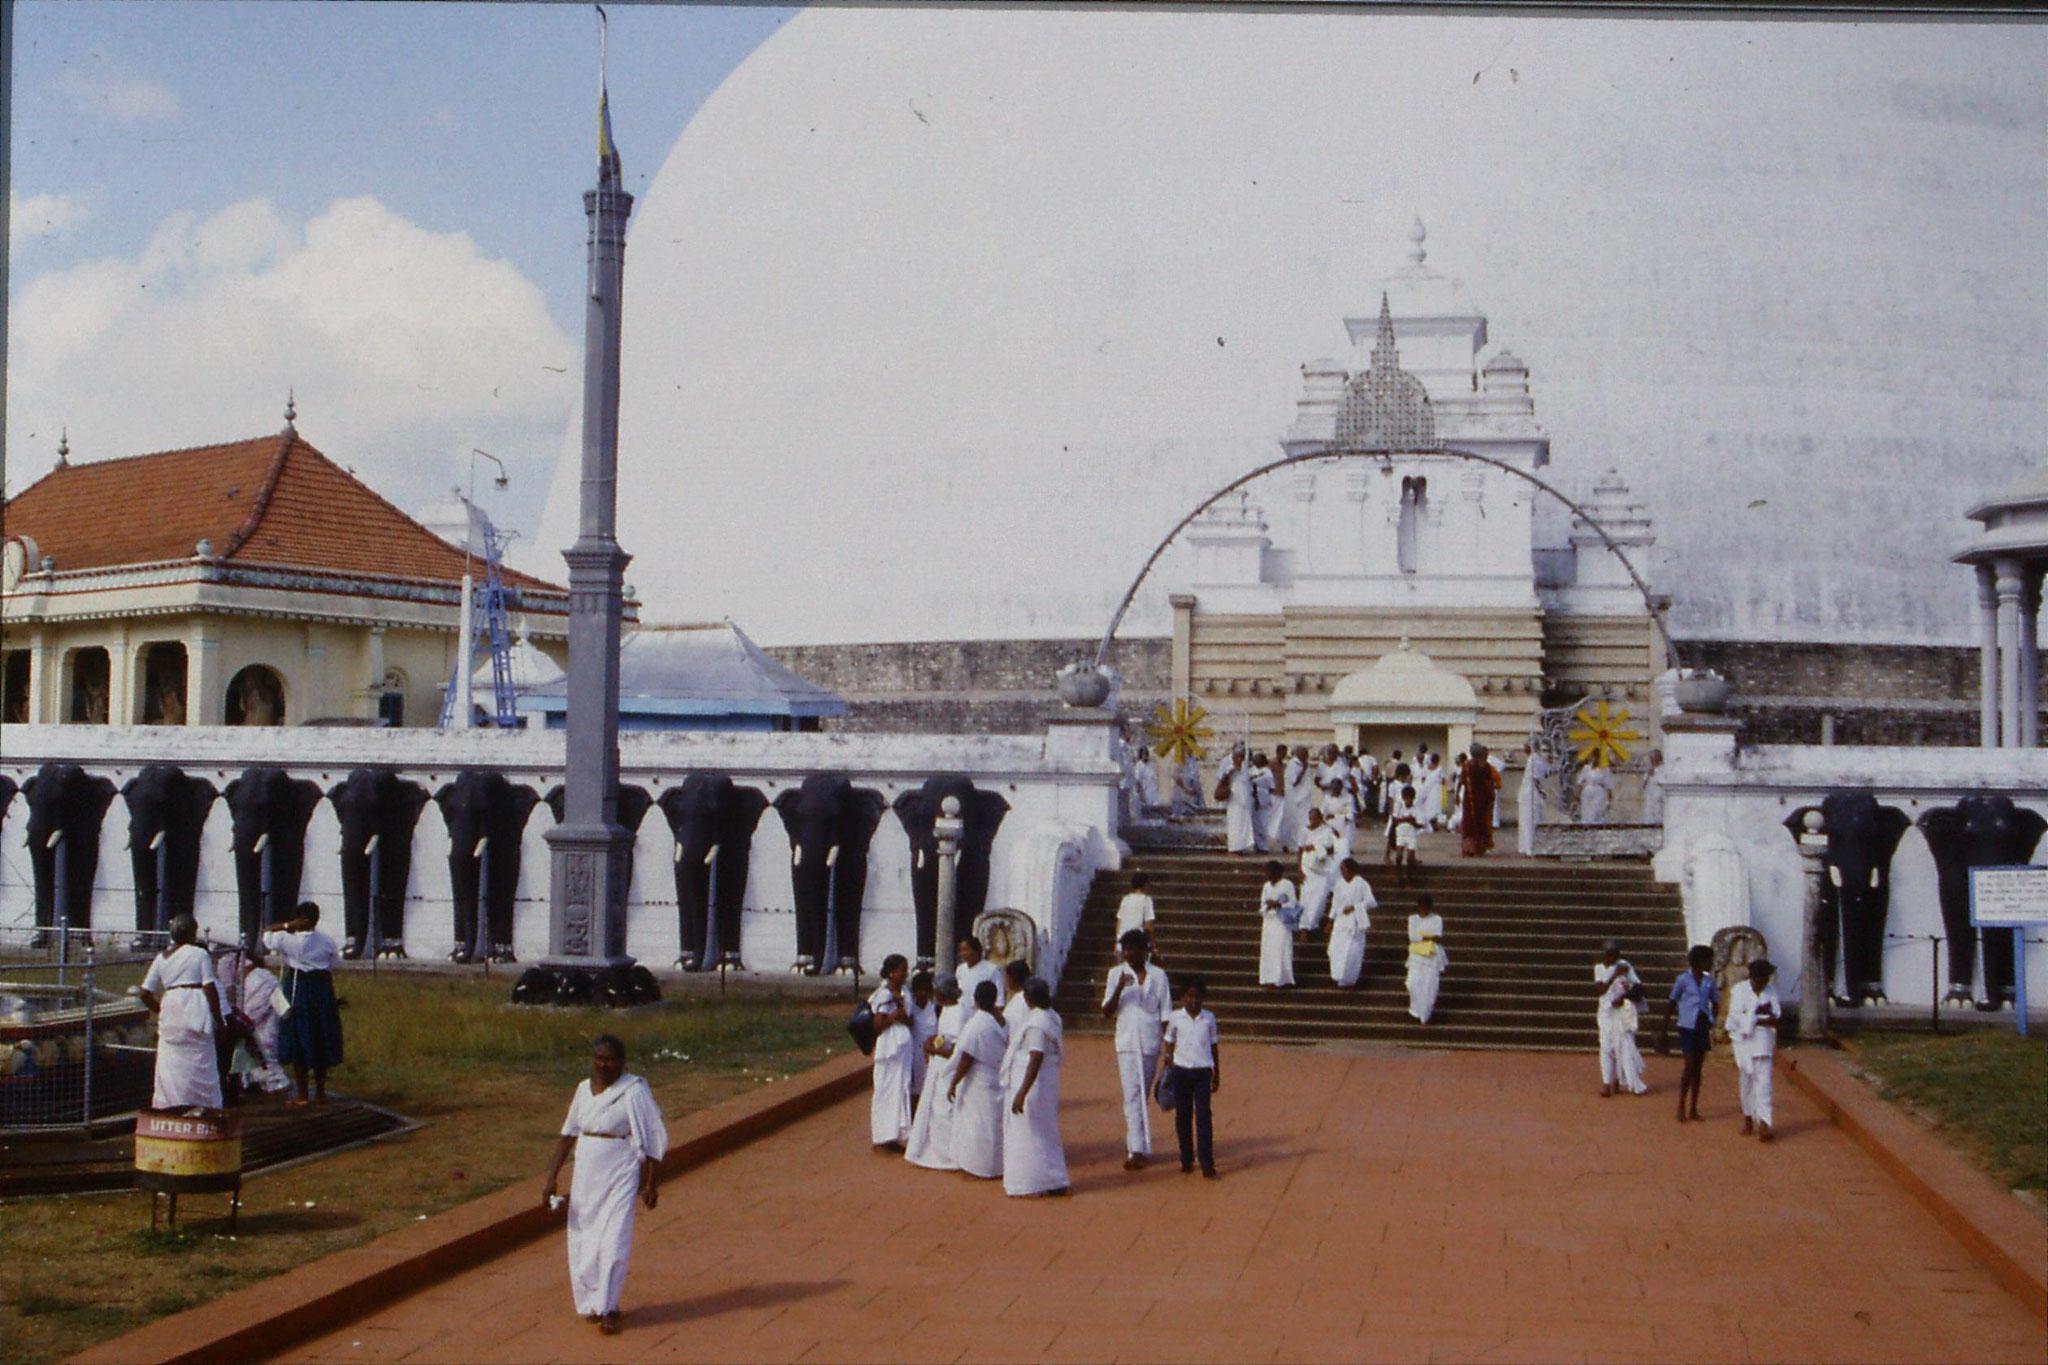 9/2/1990: 9: Anuradhapura, Ruvanvelisaya Dagoba approach